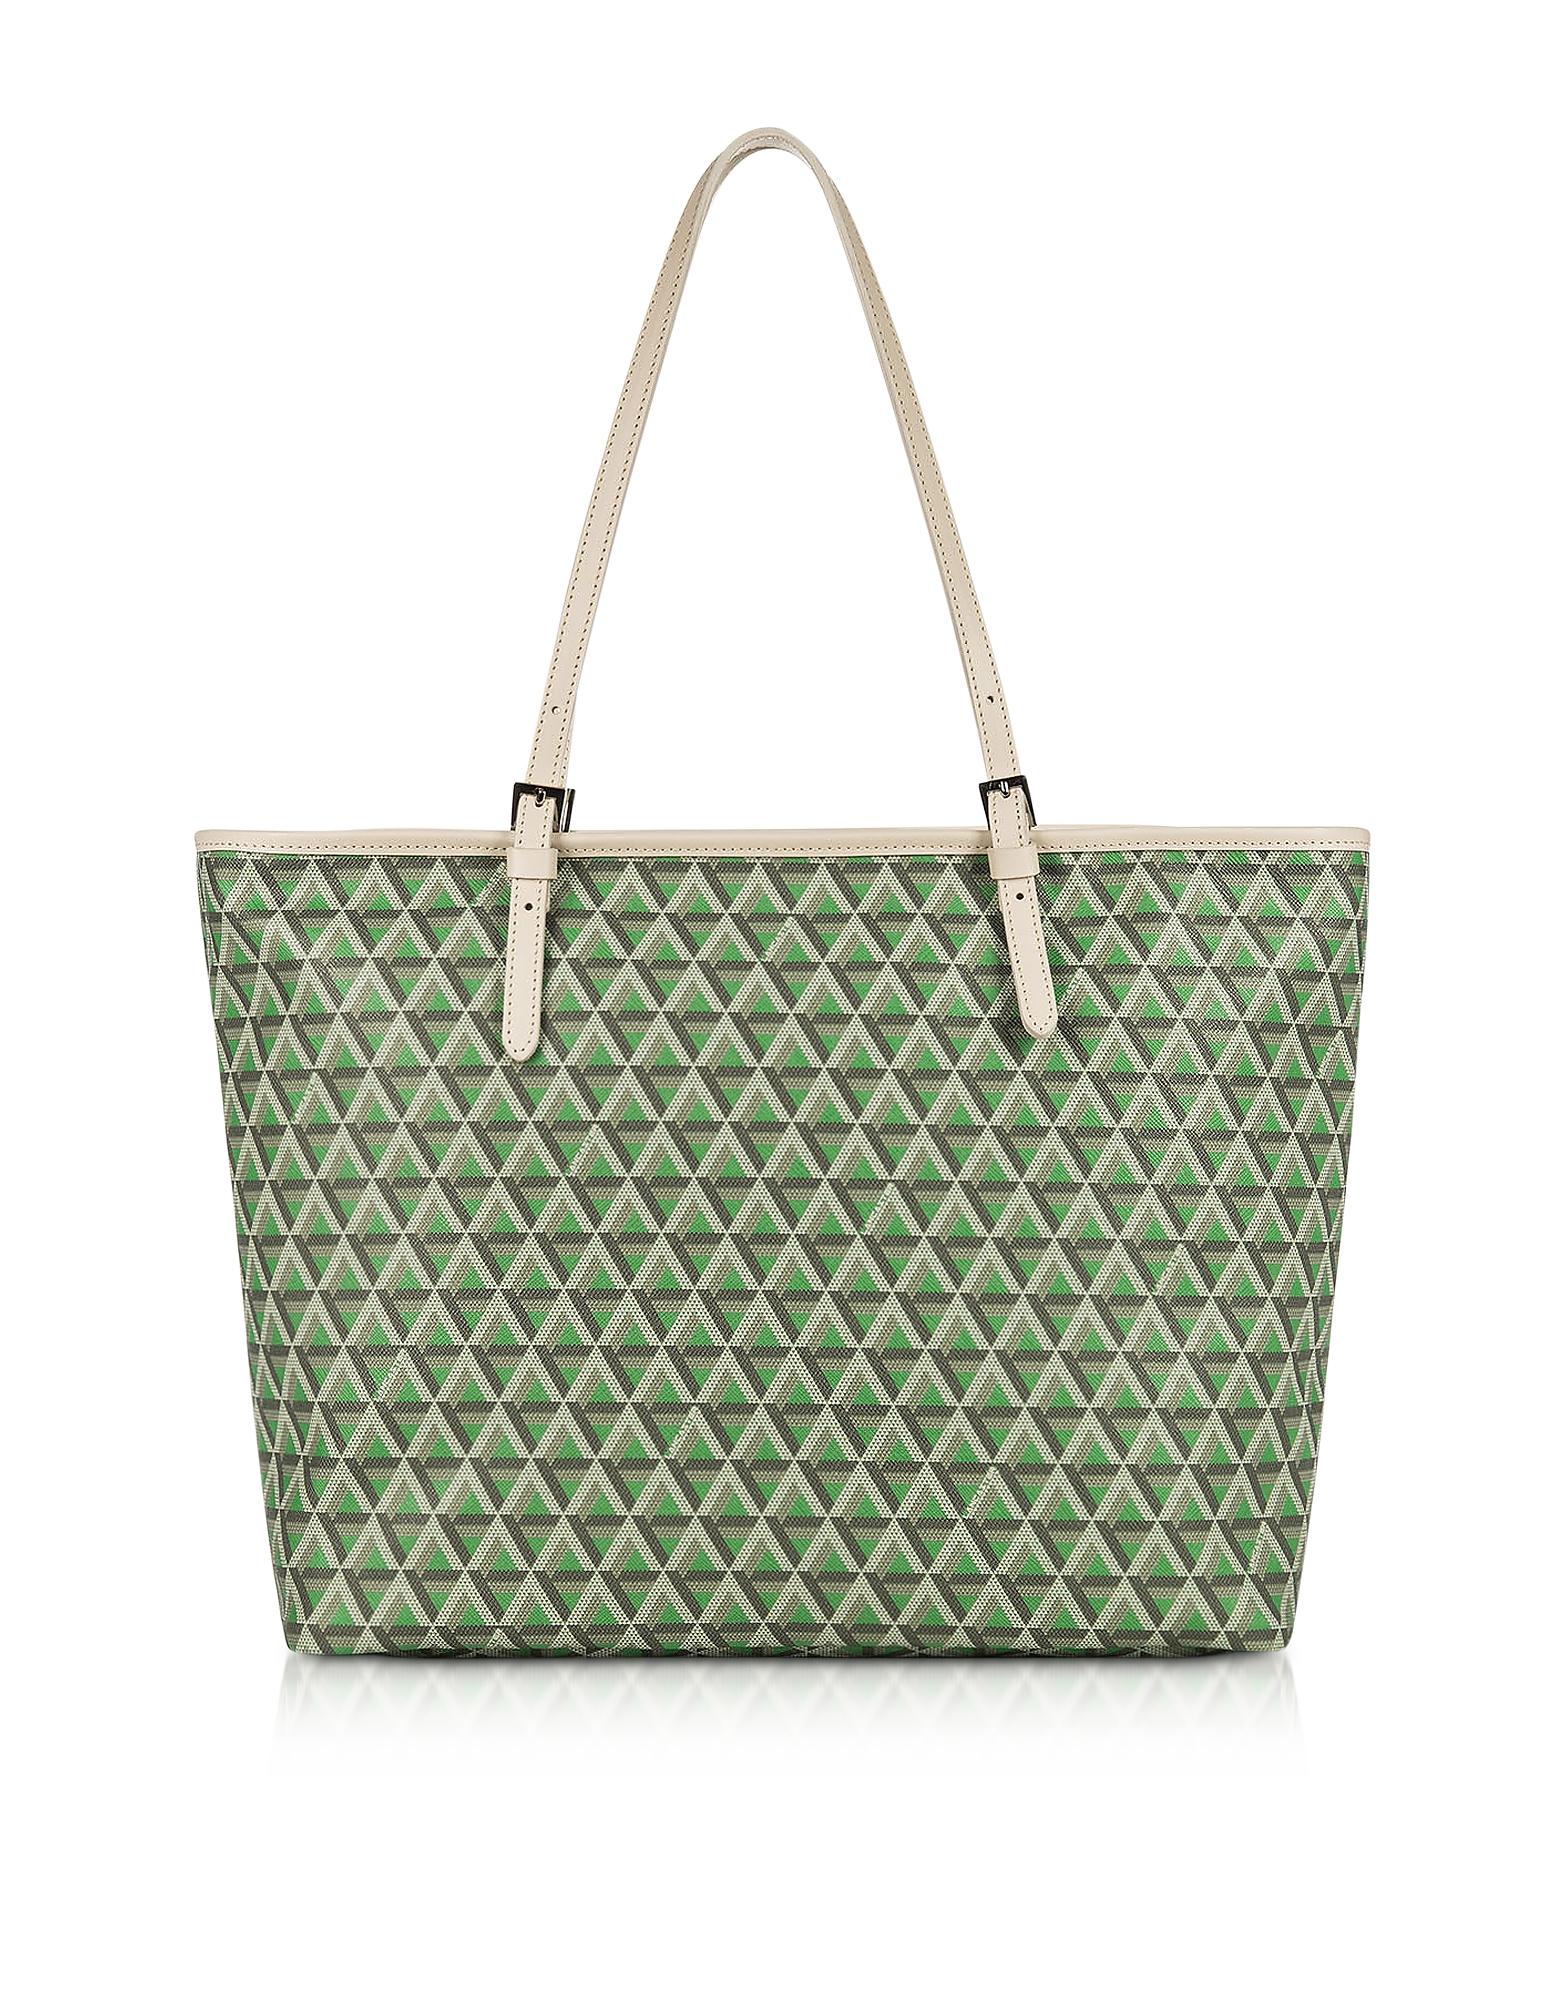 Lancaster Paris Handbags, Ikon Large Coated Canvas Tote Bag